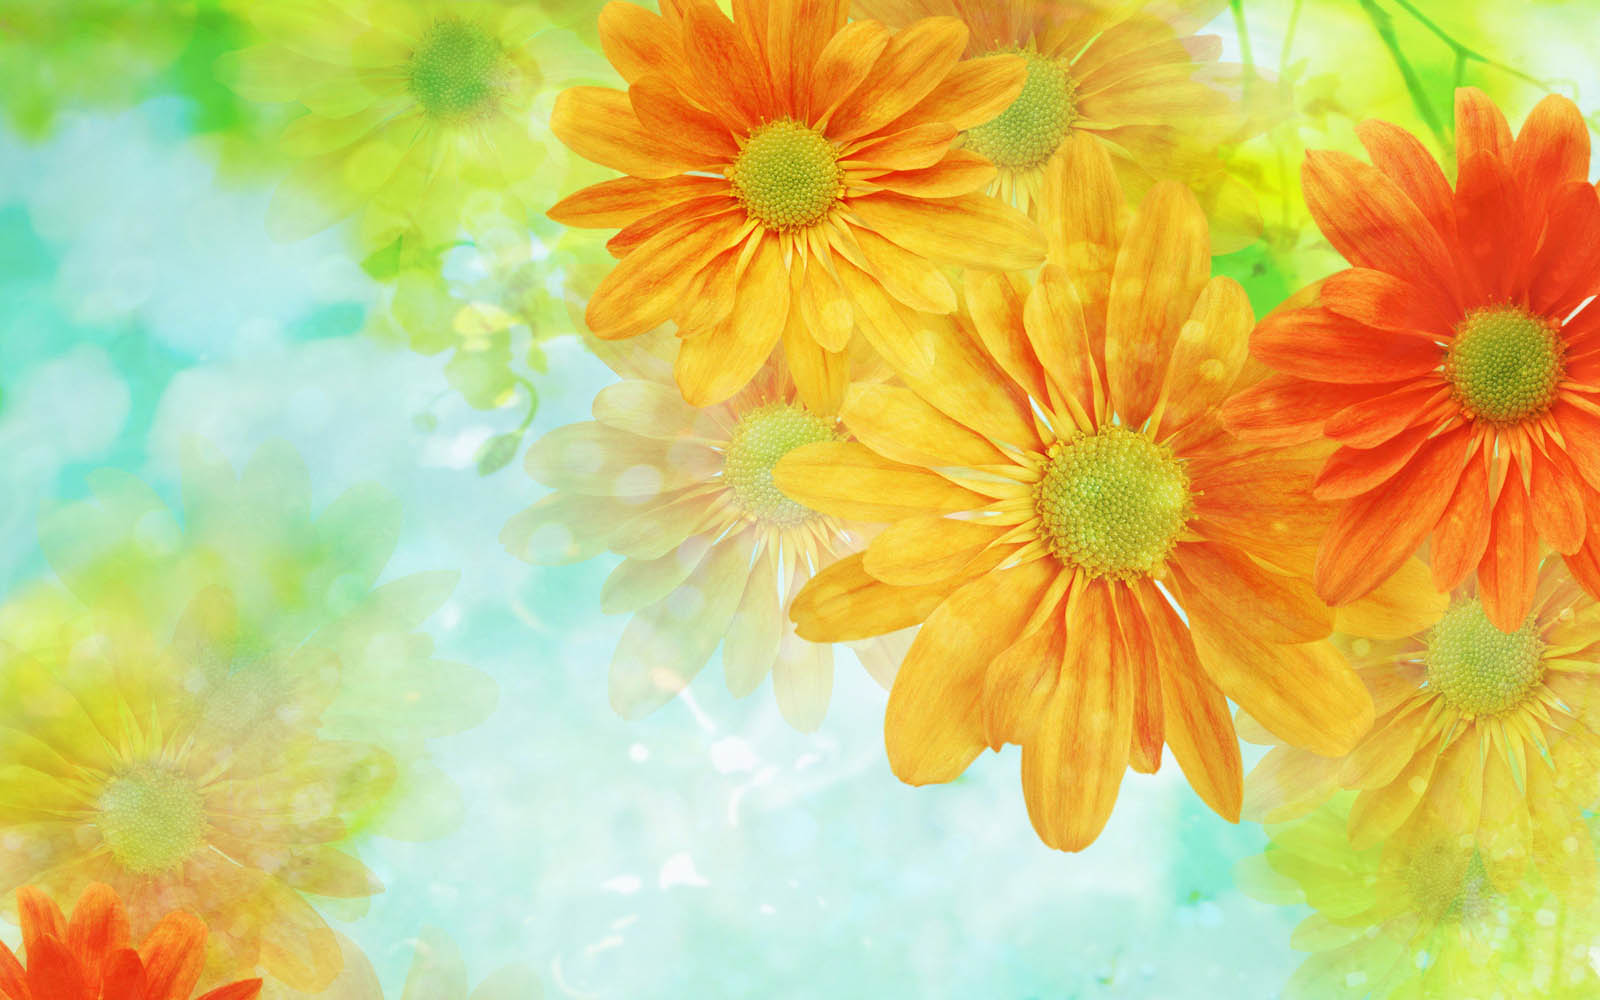 XS Wallpapers HD: Flower Art Wallpapers